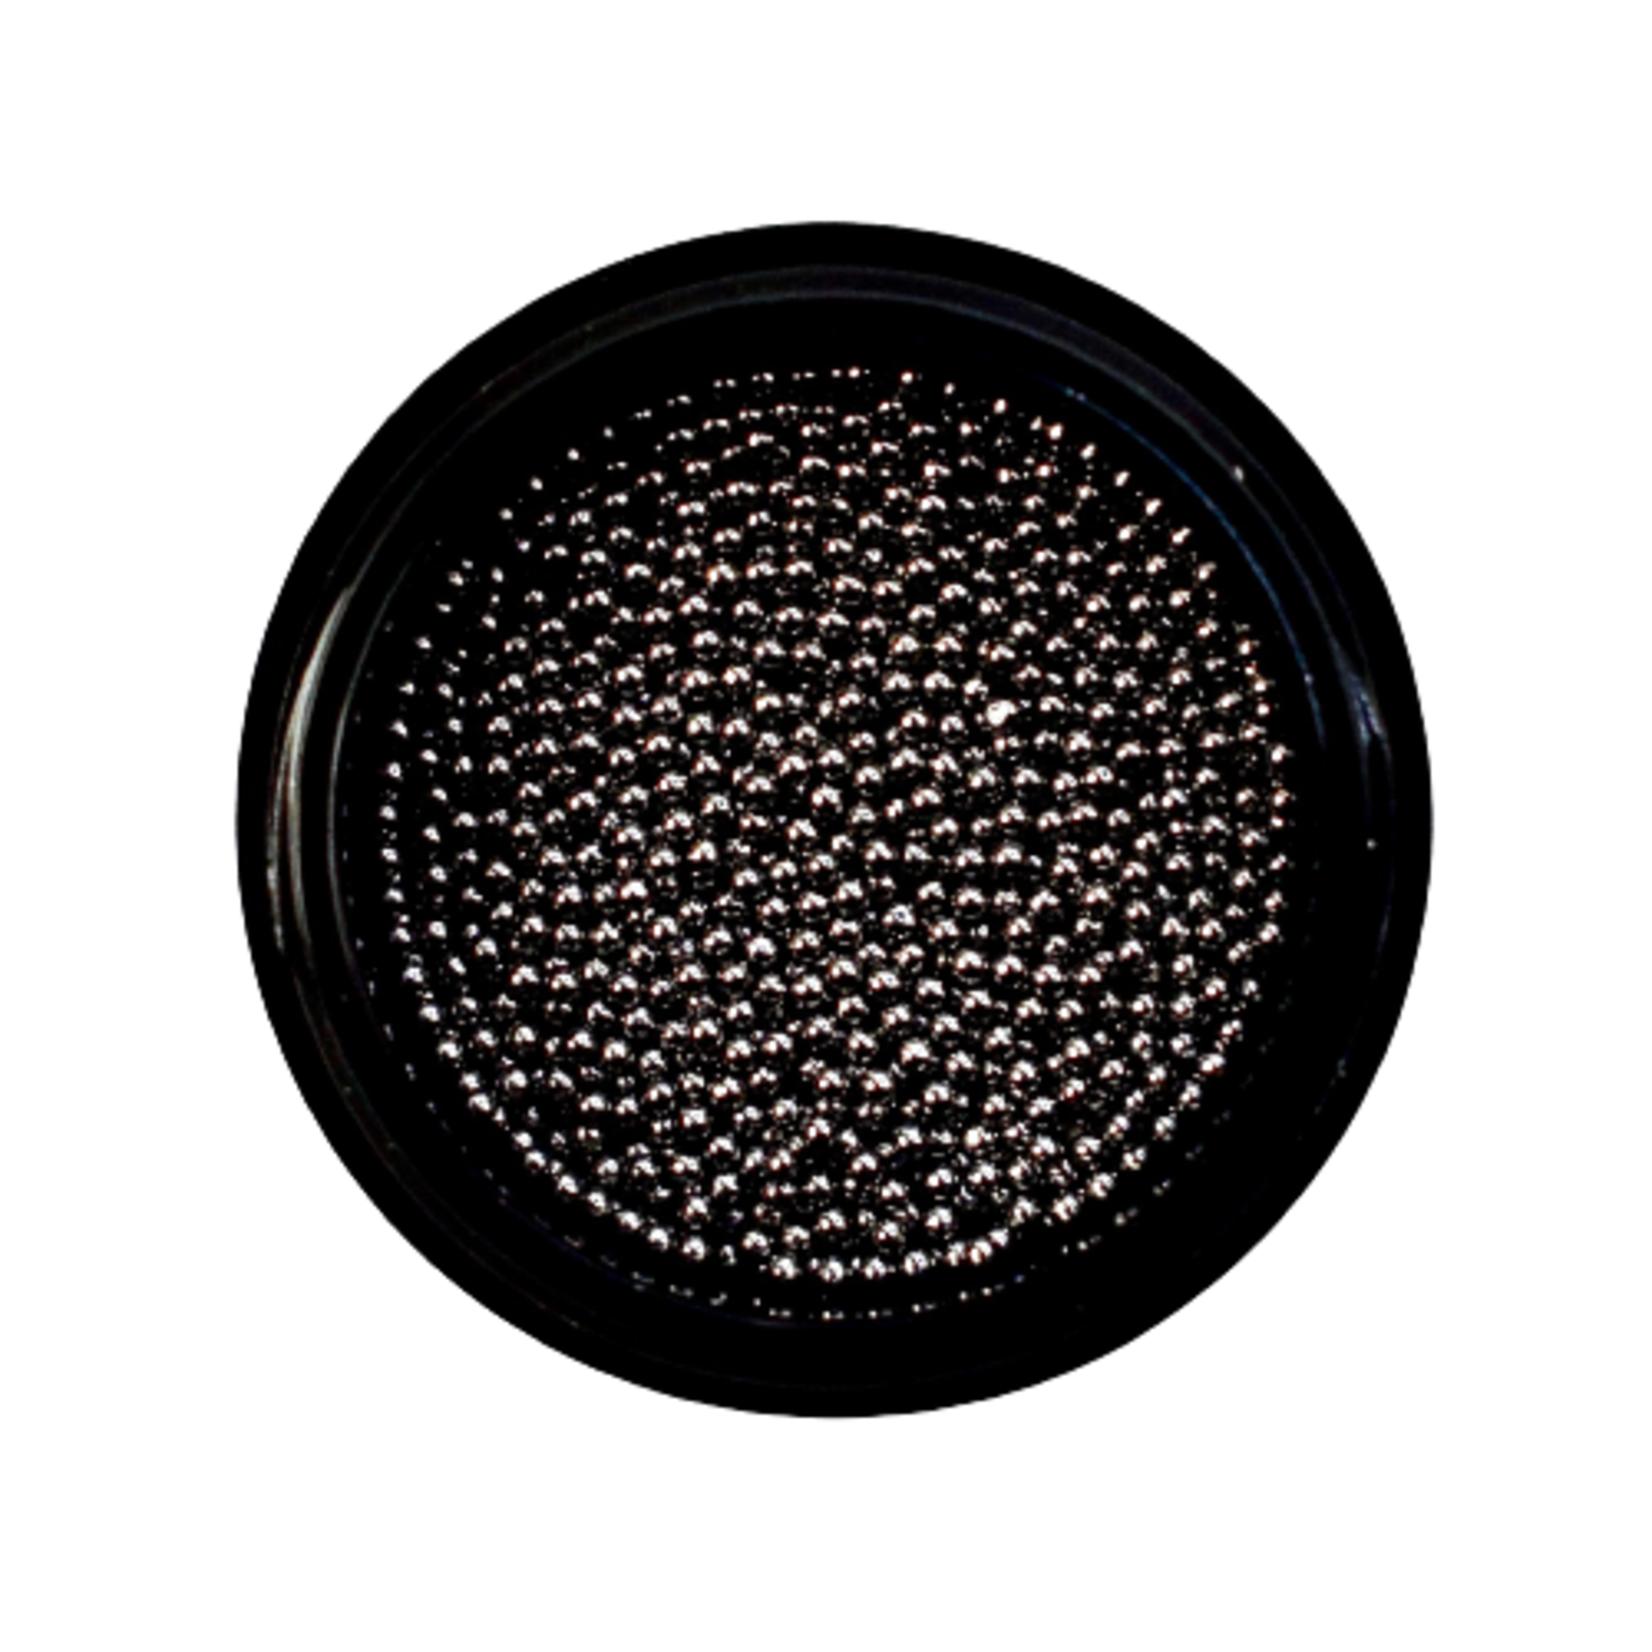 Urban Nails Caviar Beads Gun Metal Black 1.0